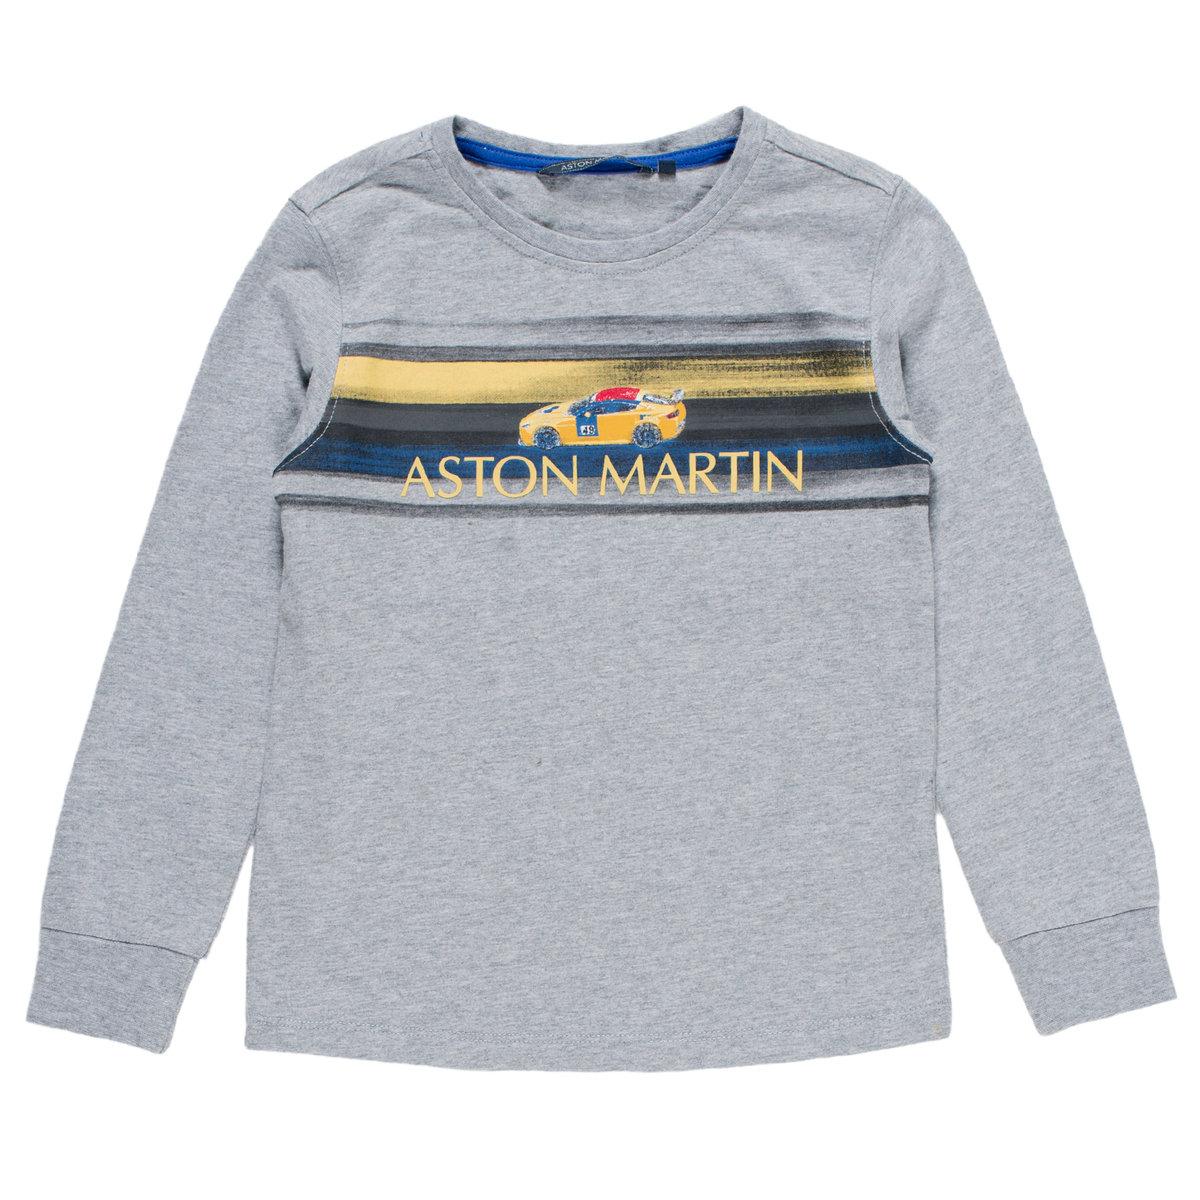 3a87a88c5 Toddler Boy Graphic Tee-shirt | Aston Martin T-Shirts, Shirts ...